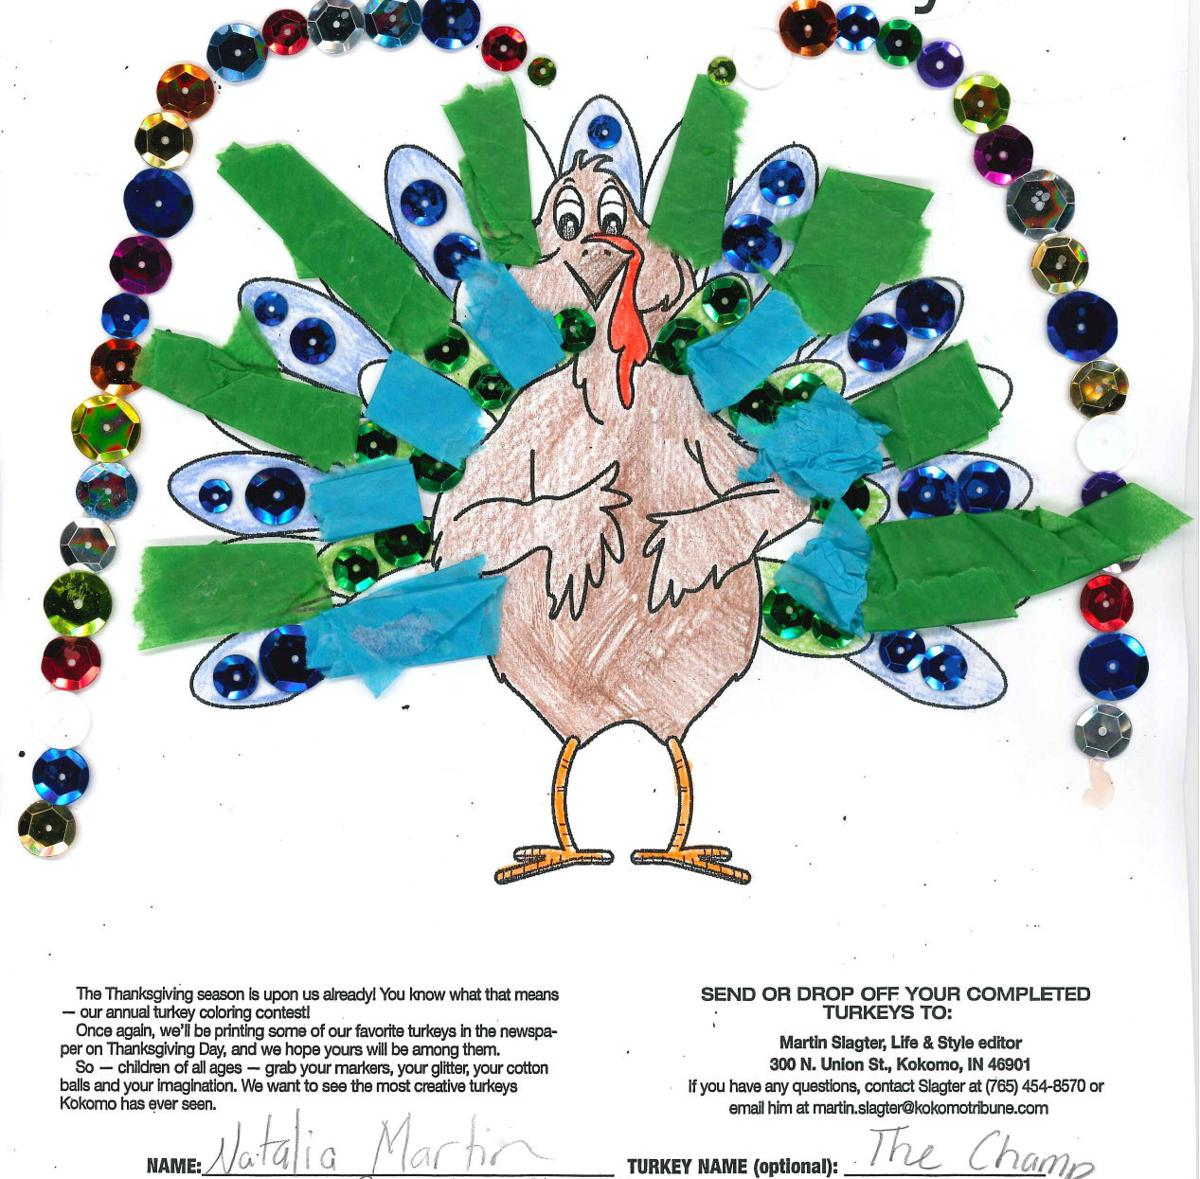 Time for Turkey entries M-Q (By first name) | | kokomotribune.com